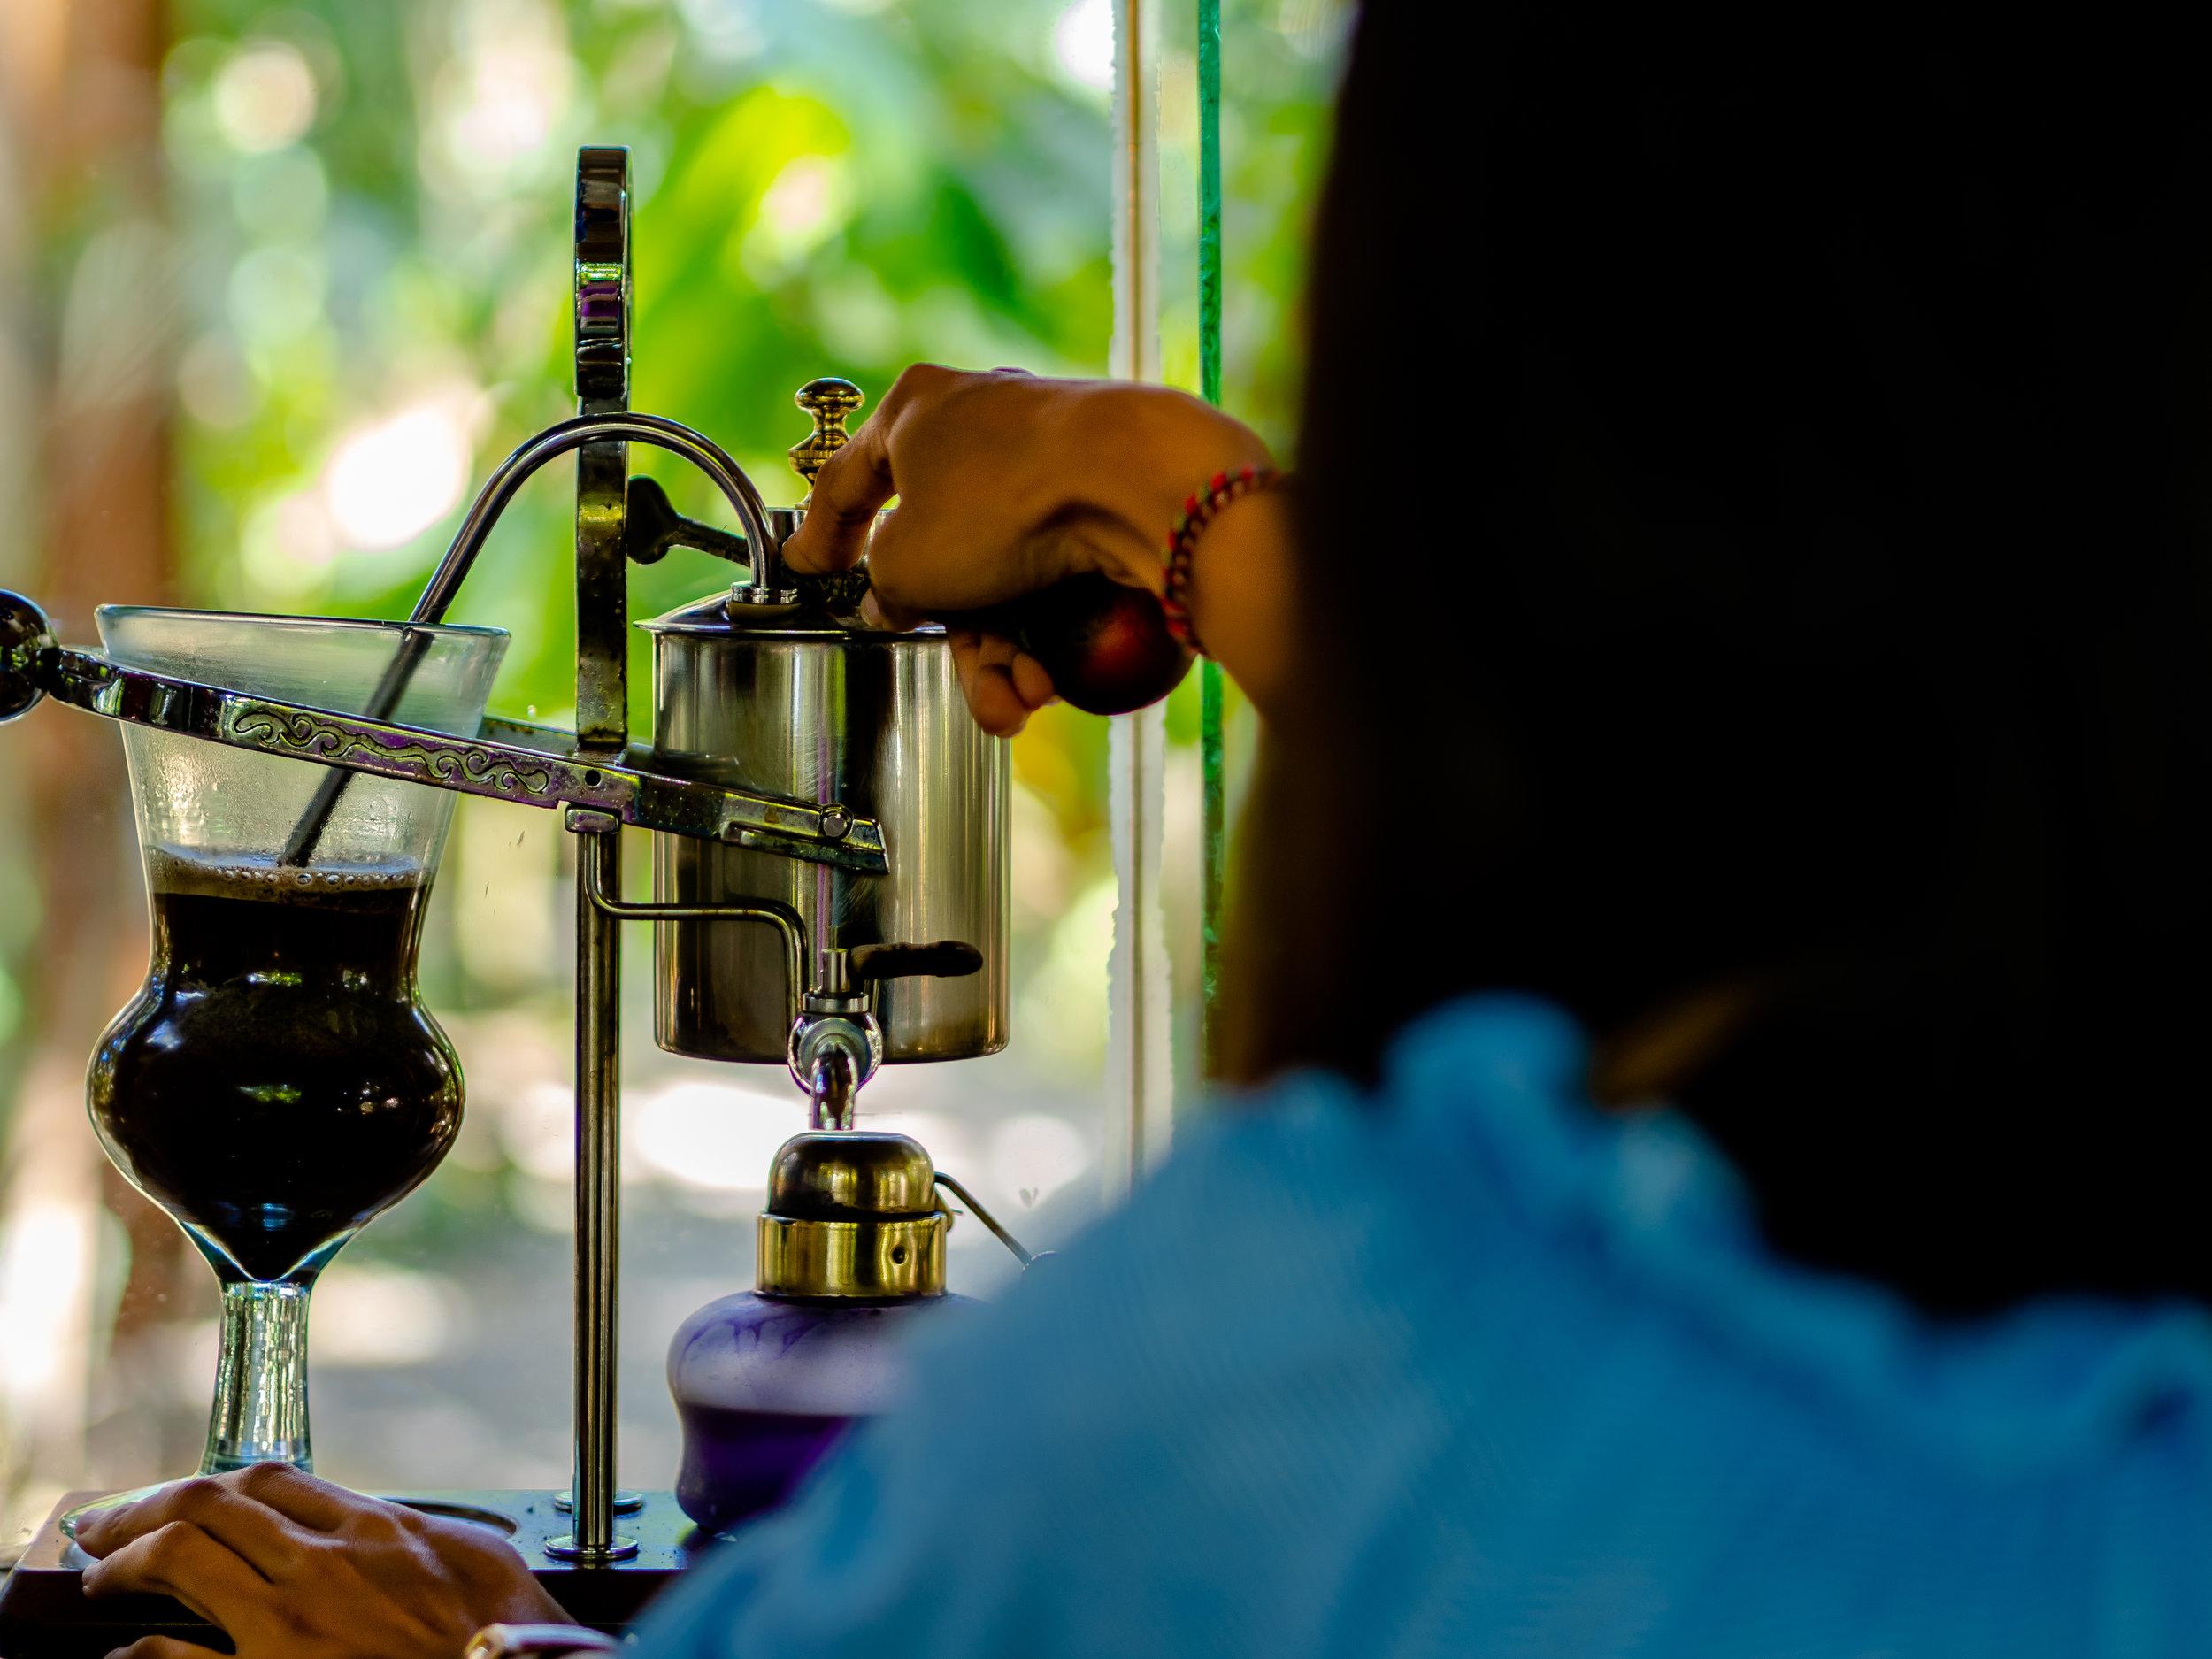 Bali Indonesia Coffee - Kopi Luwak - Seth T. Buckley